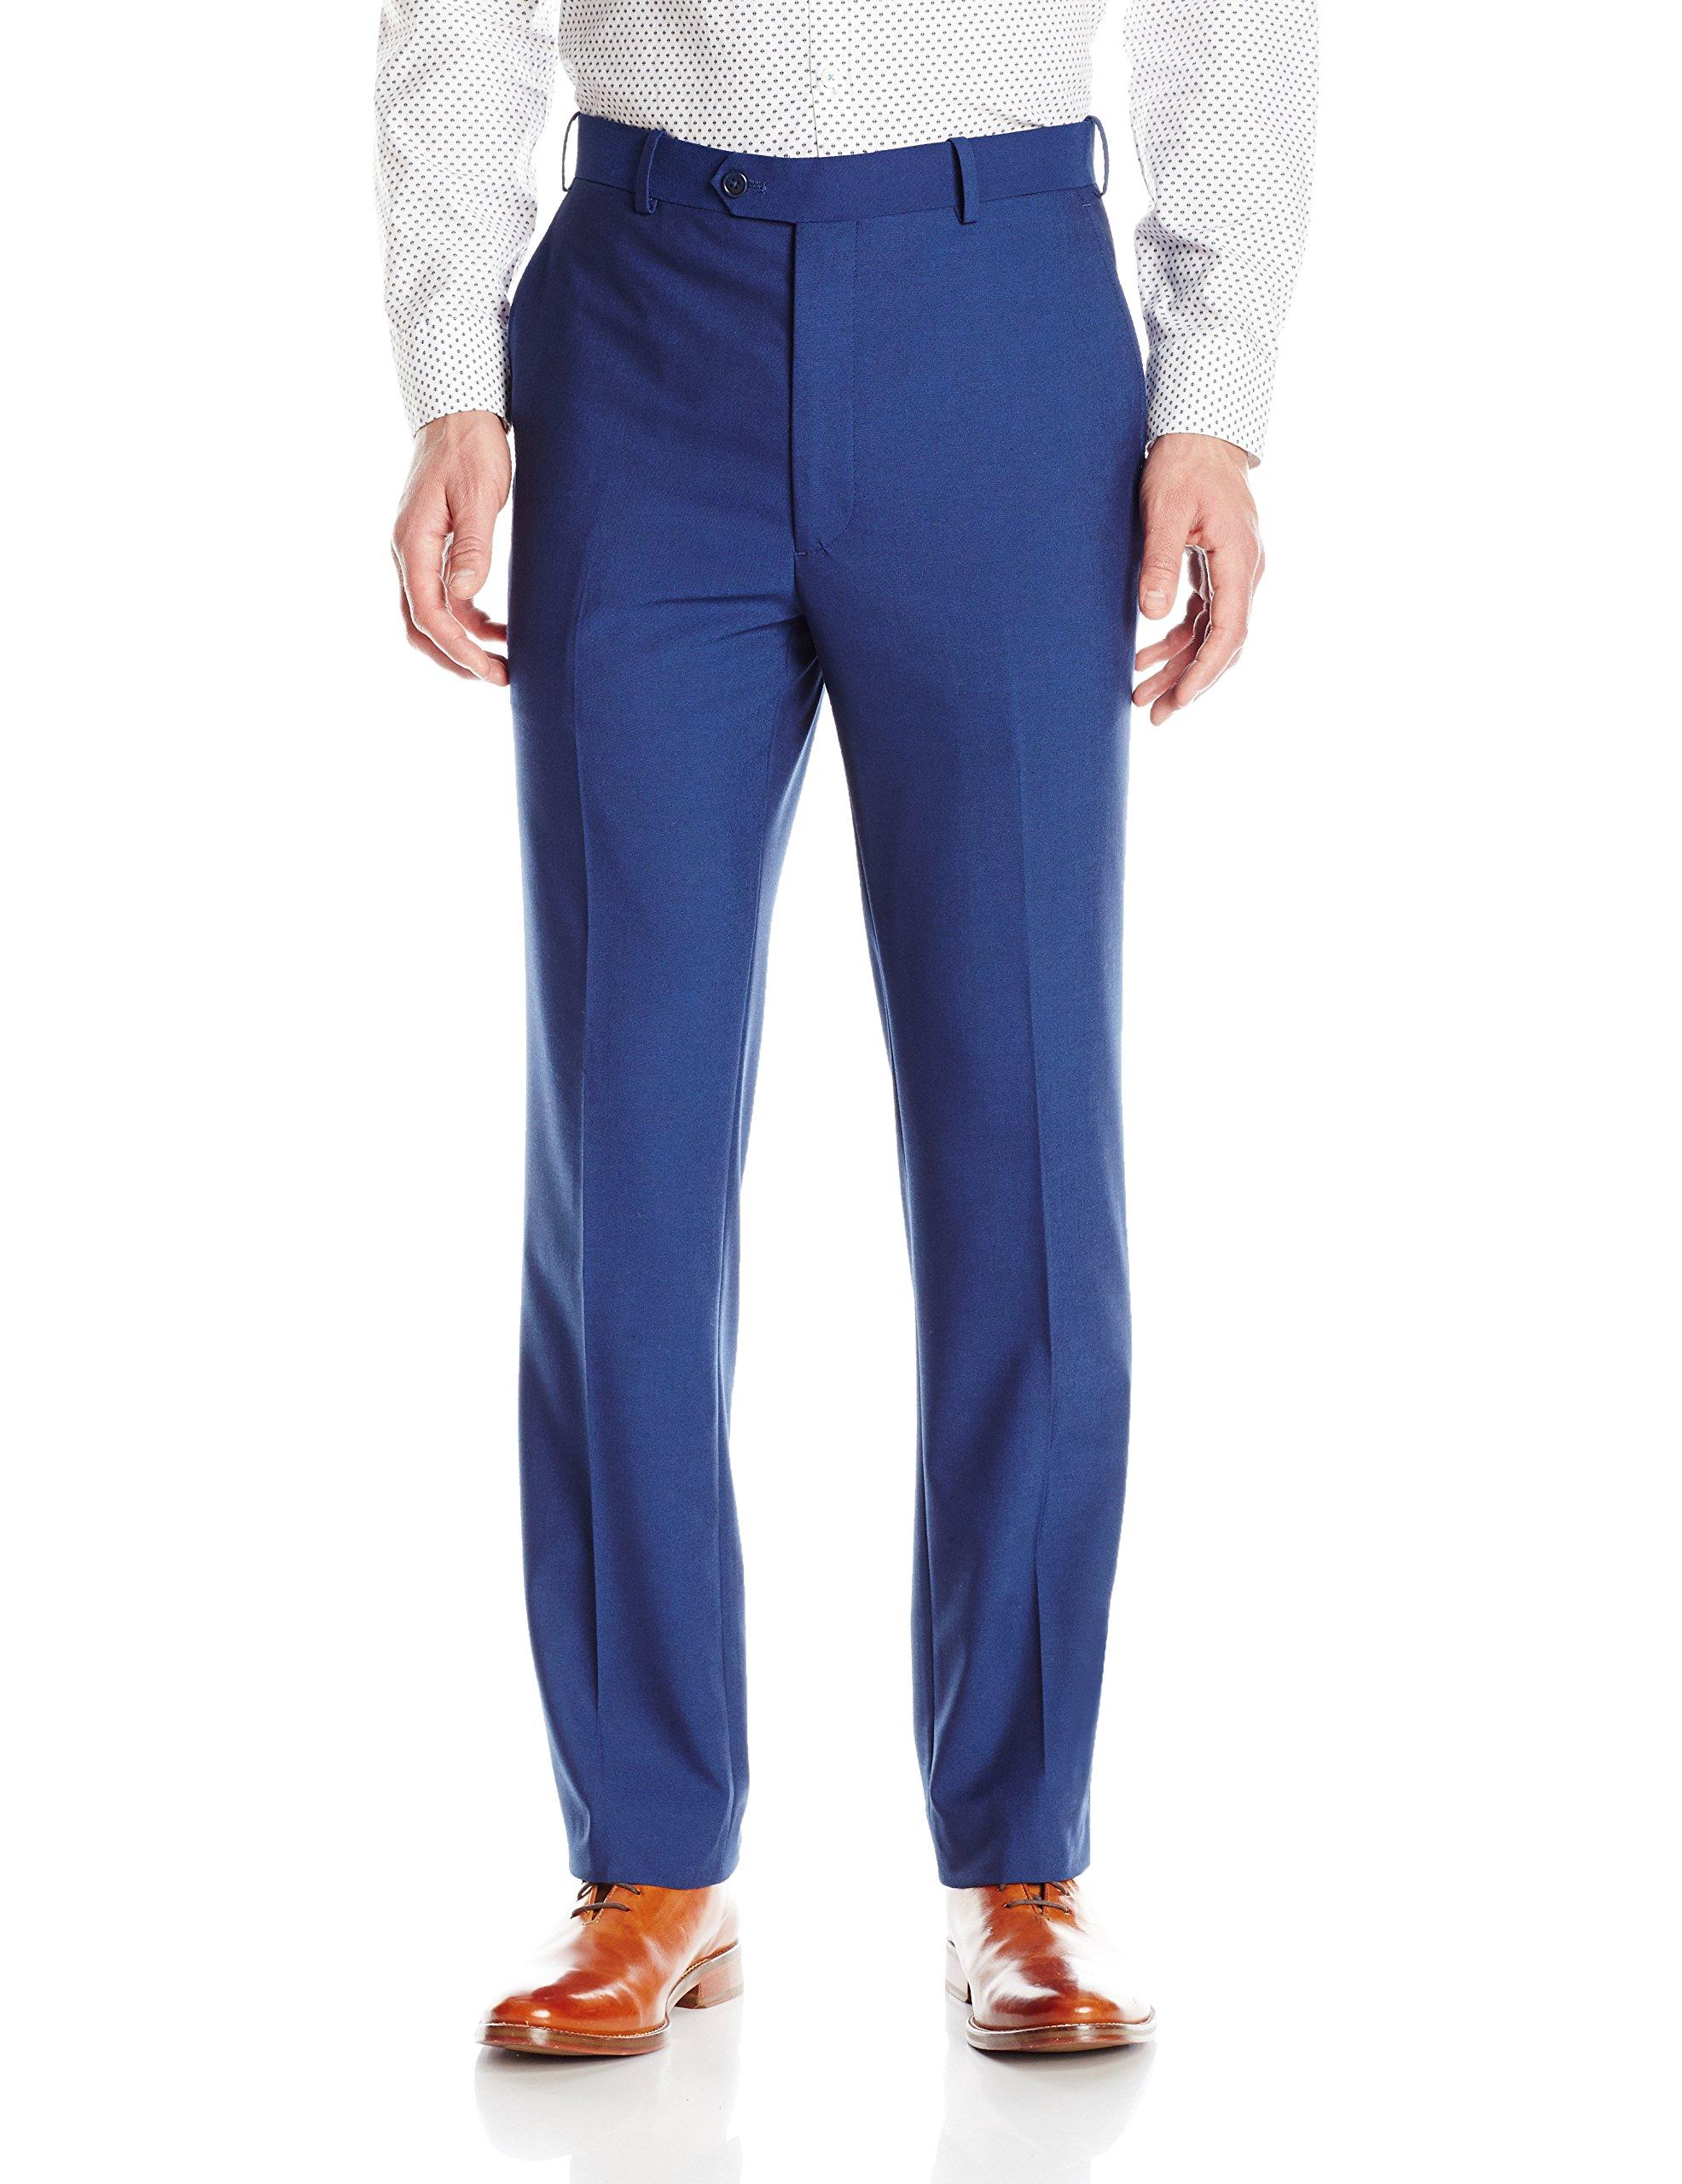 Adolfo Men's Micro Tech Slim Fit Flat Front Suit Pant, Blue with Lycra Stretch, 40Wx30L